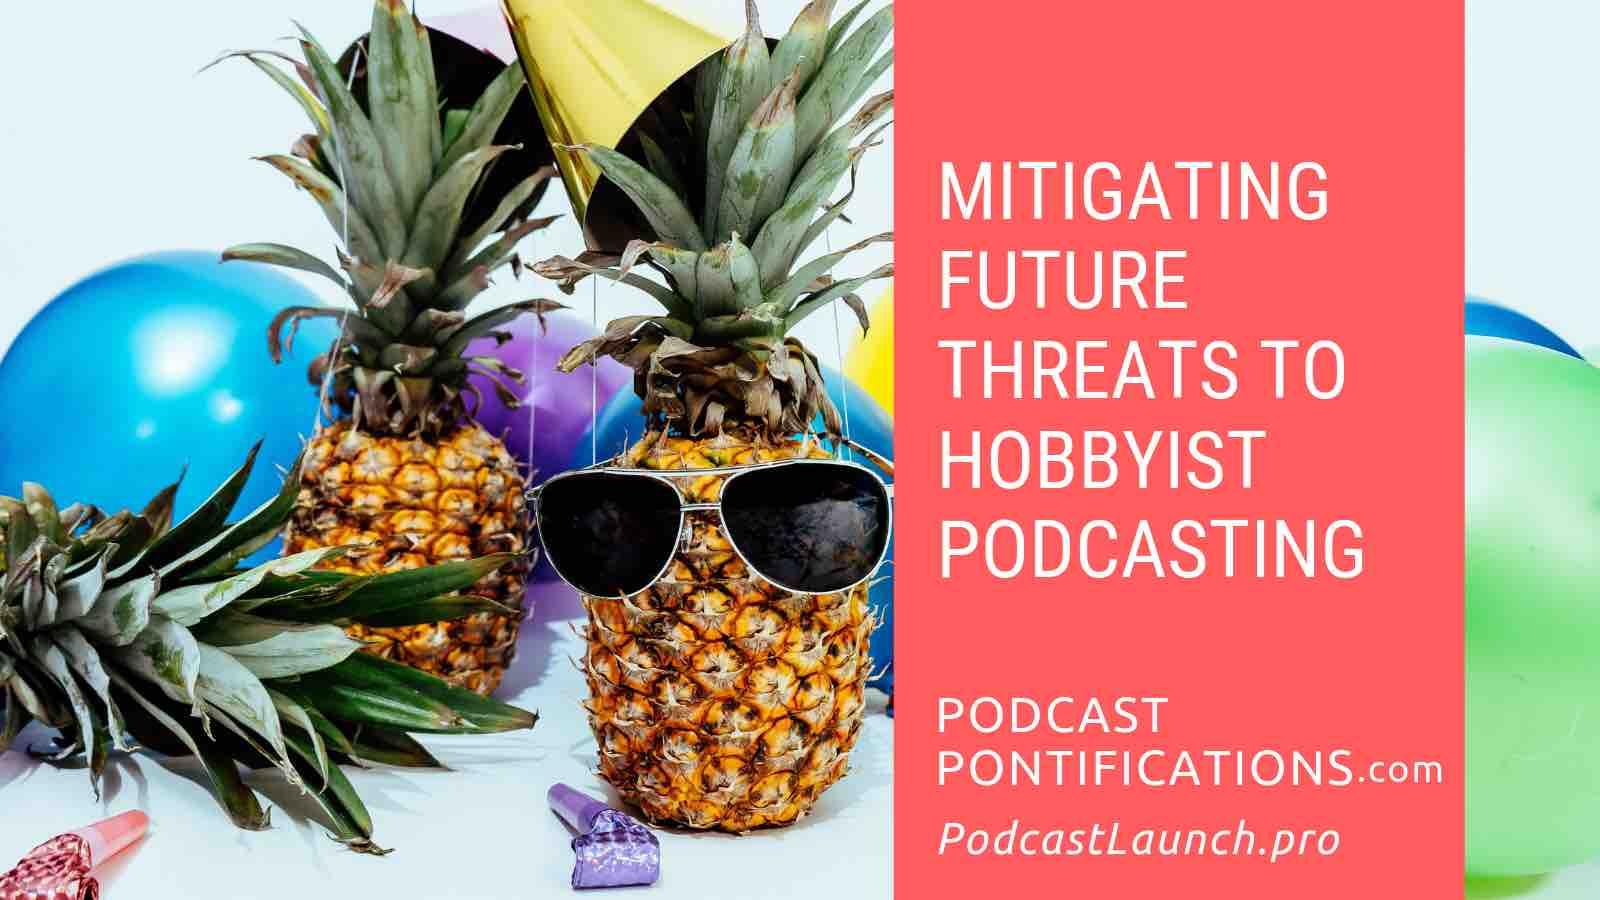 Mitigating Future Threats To Hobbyist Podcasting